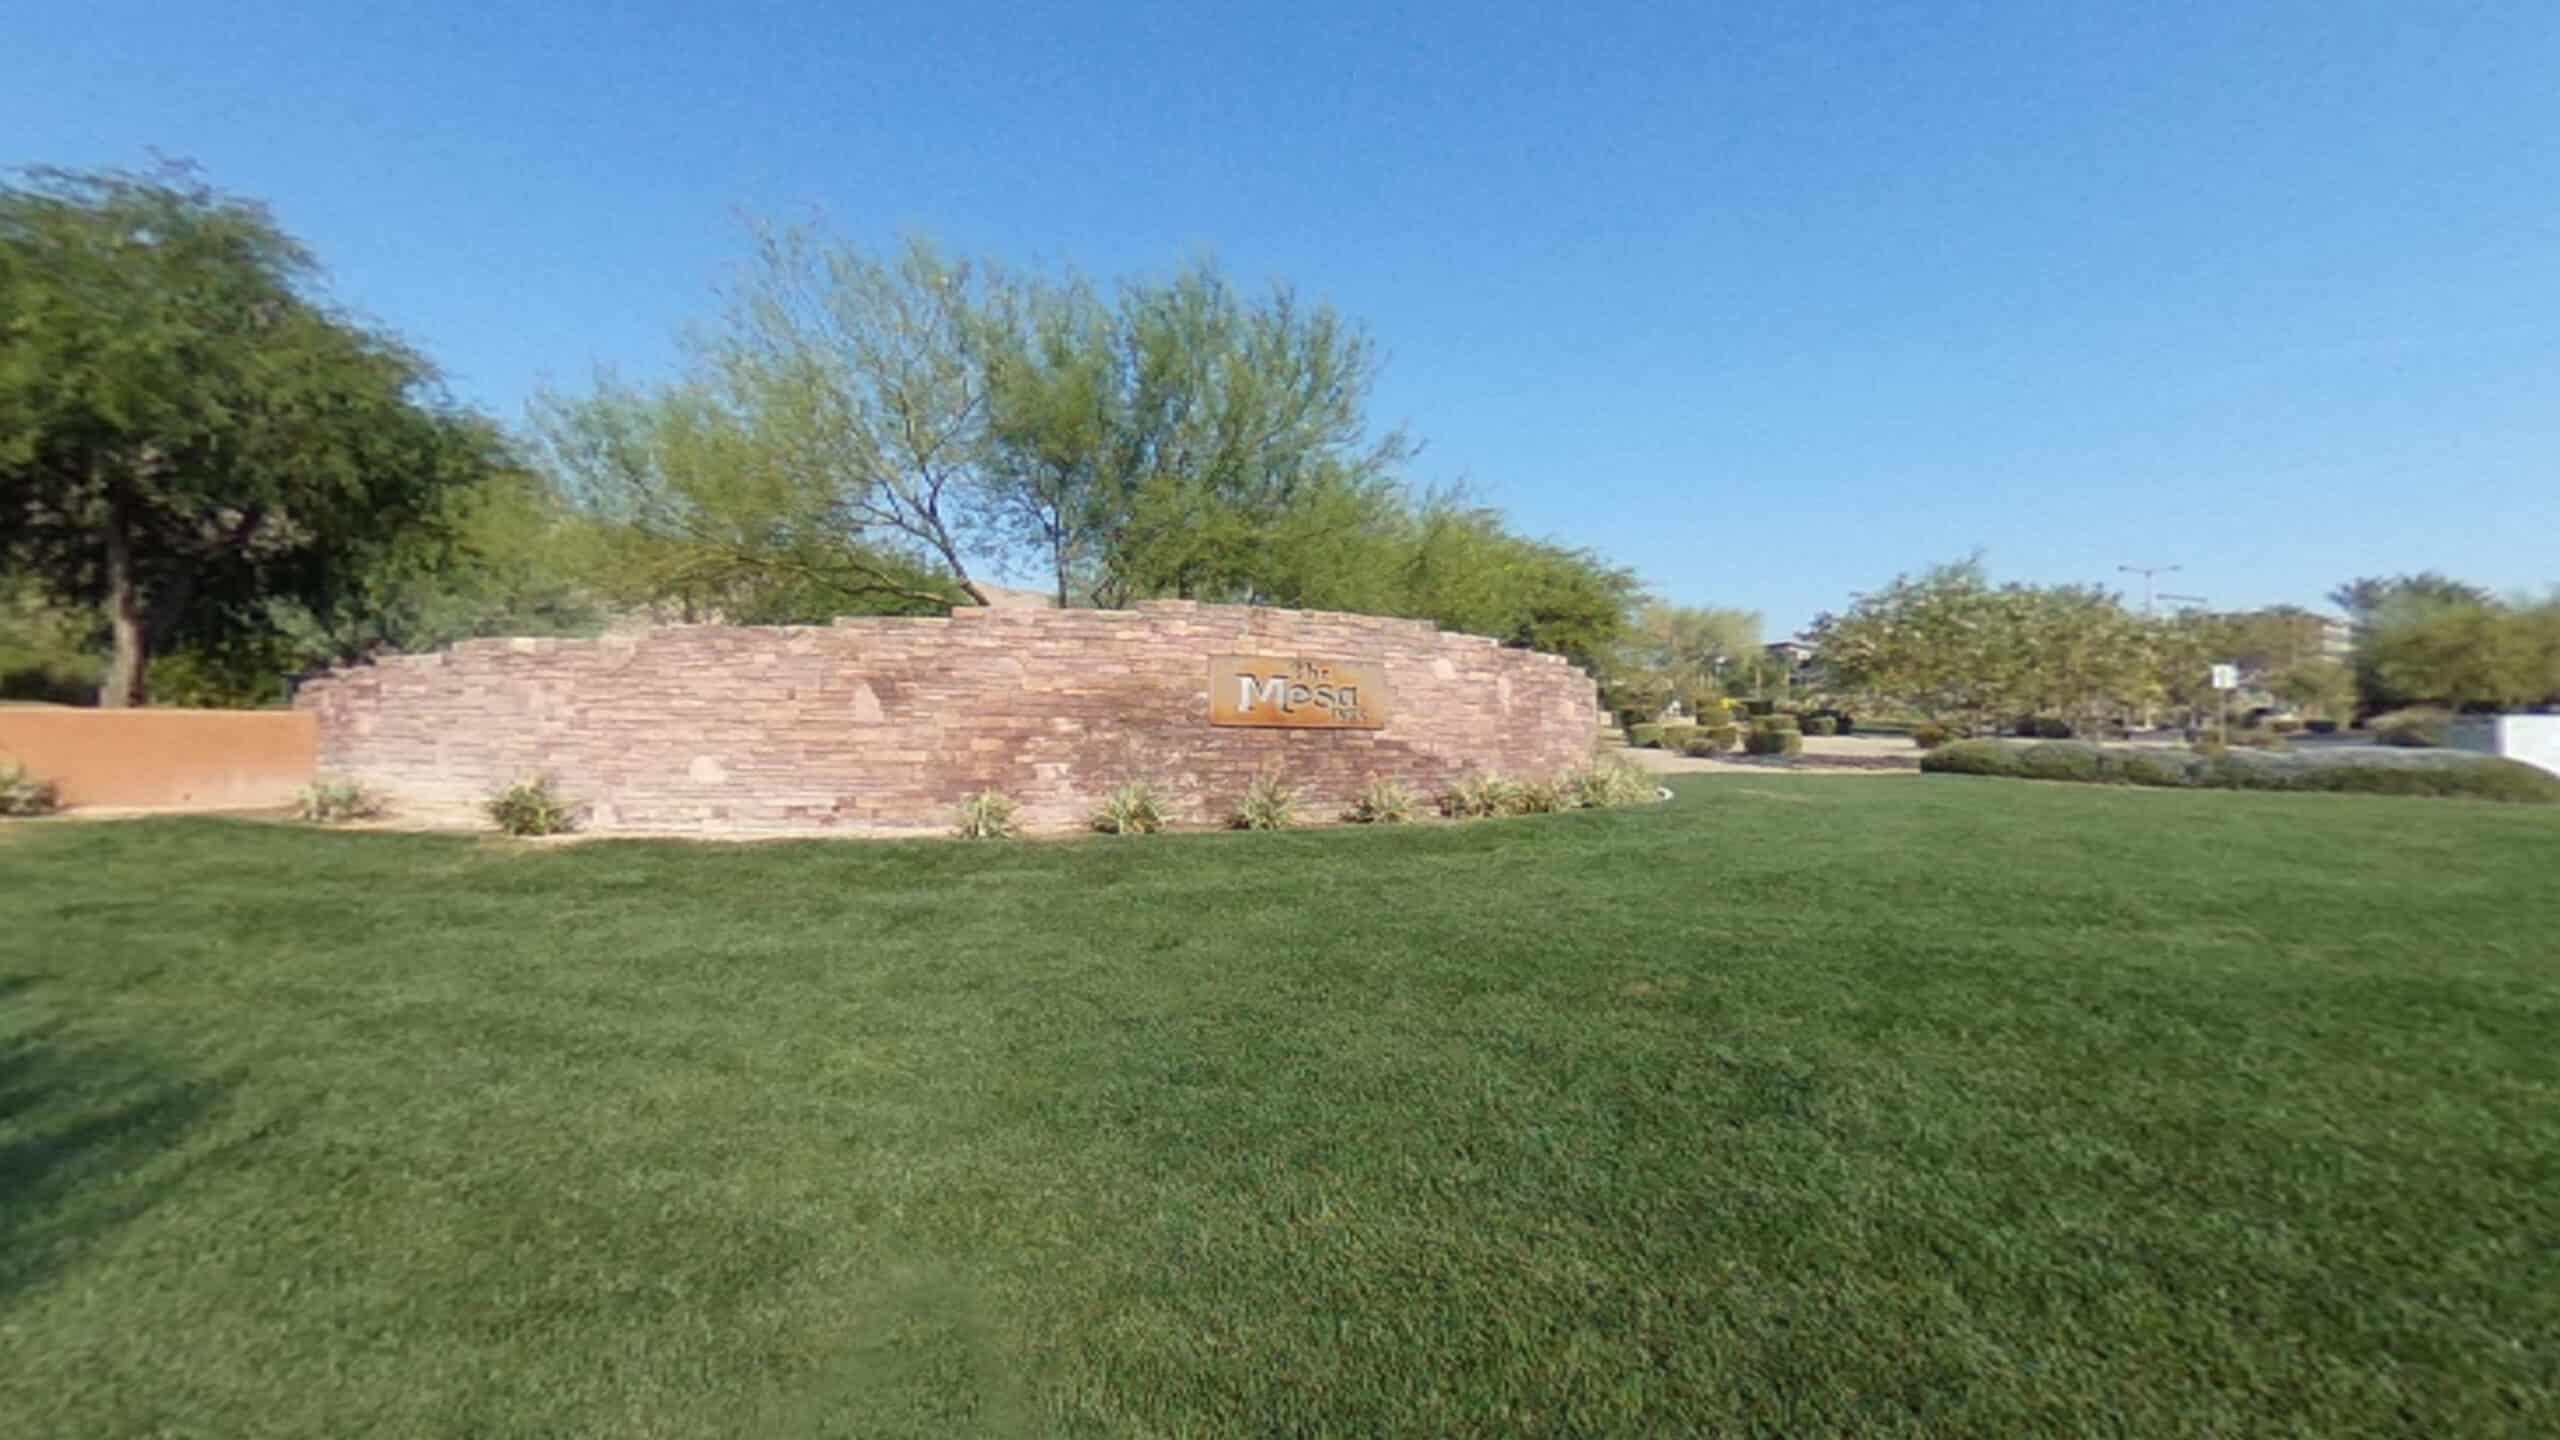 Mesa Park Las Vegas